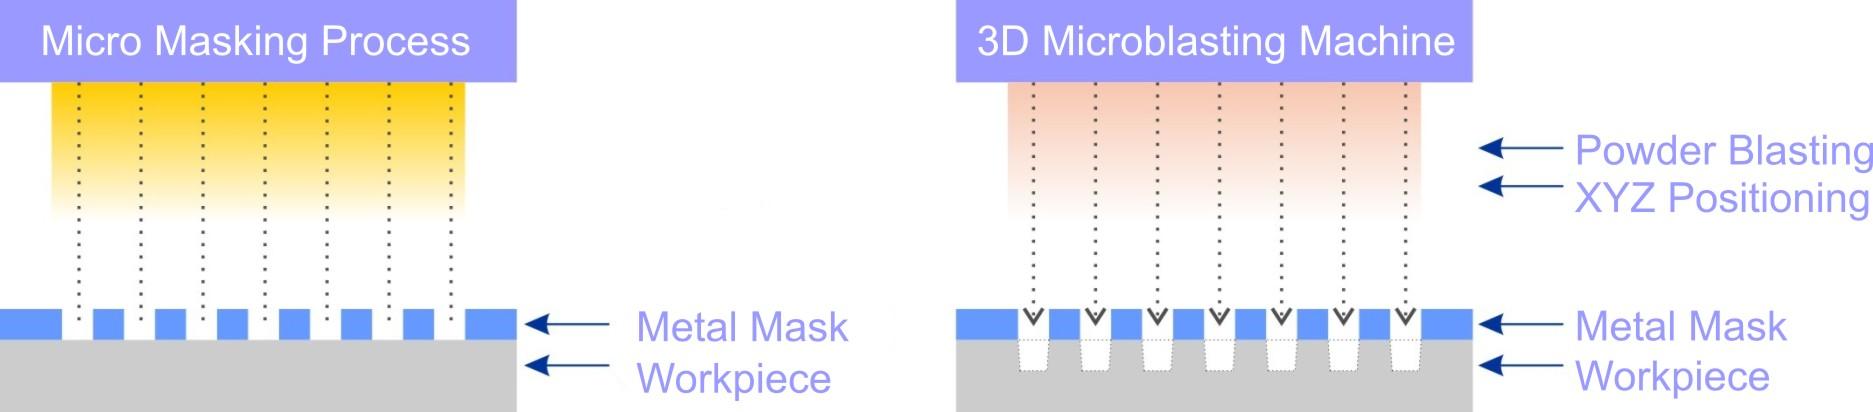 3D Microblasting Technology.jpg